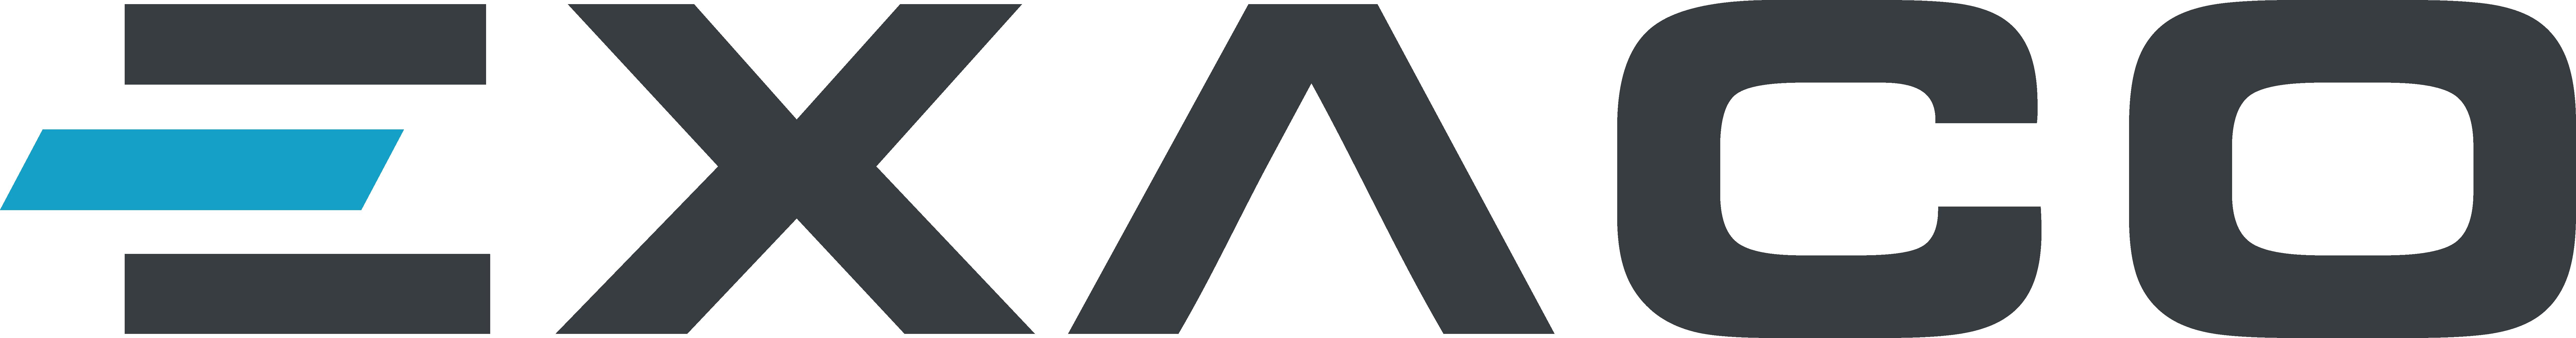 Exaco Logo